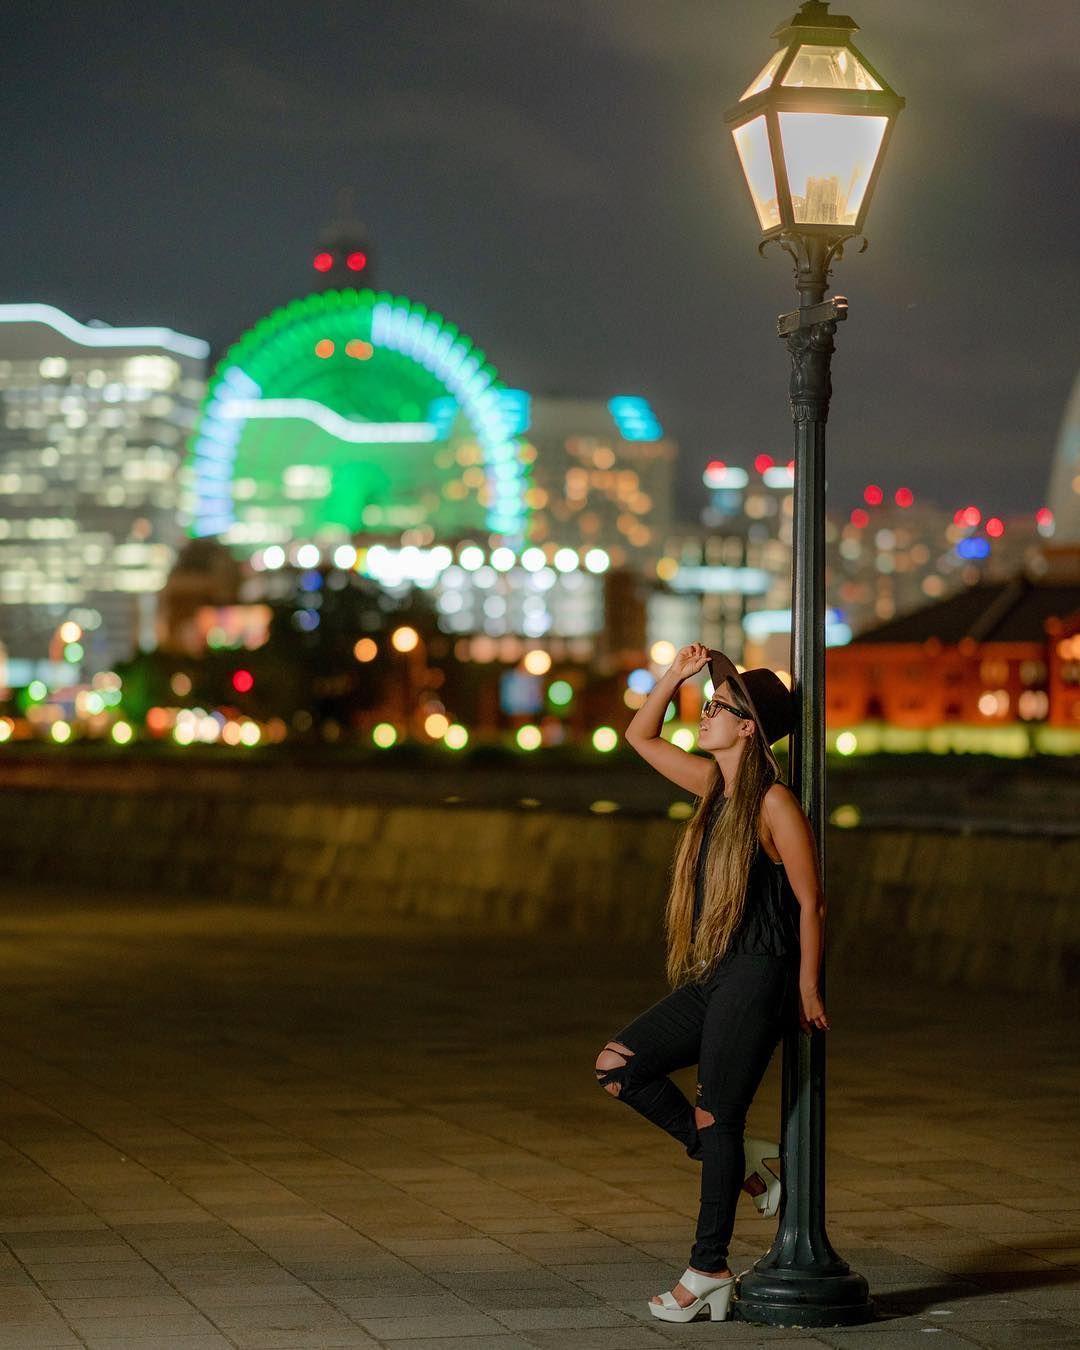 Dai Alpha7 On Instagram 古き良き文化と近代が交じり合う横浜港 夜も魅せてくれます Sony A7r Sony Fe85gm 神奈川県横浜 横浜 みなとみらい 大さん橋 象の鼻パーク 赤レンガ倉庫 Tcc Yo 大さん橋 横浜 みなとみらい